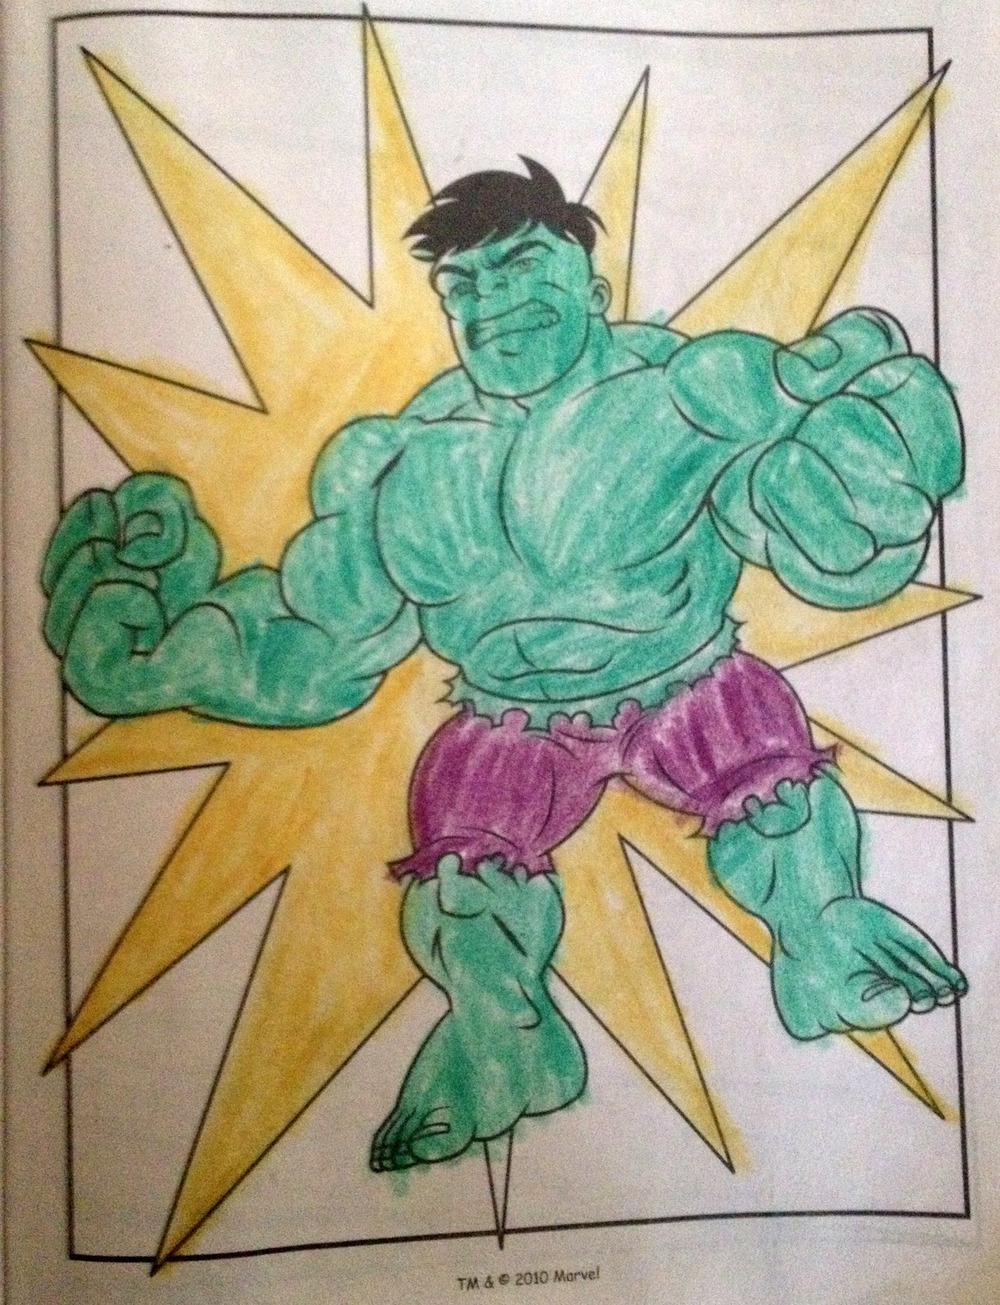 the-hulk-02.jpg